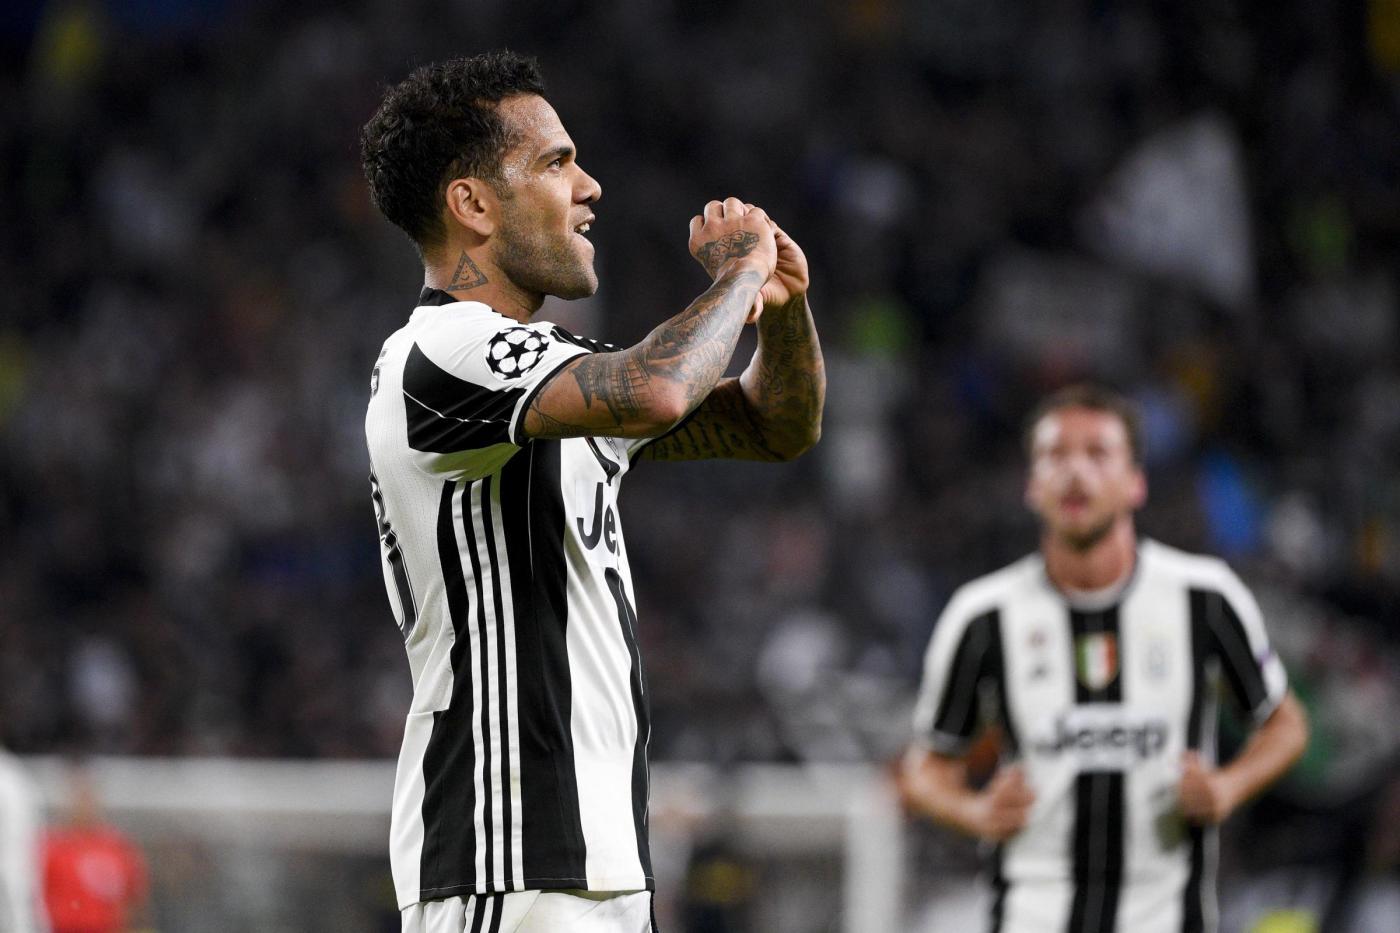 Coppa Italia: Juventus avanti a 2,05 su Betaland